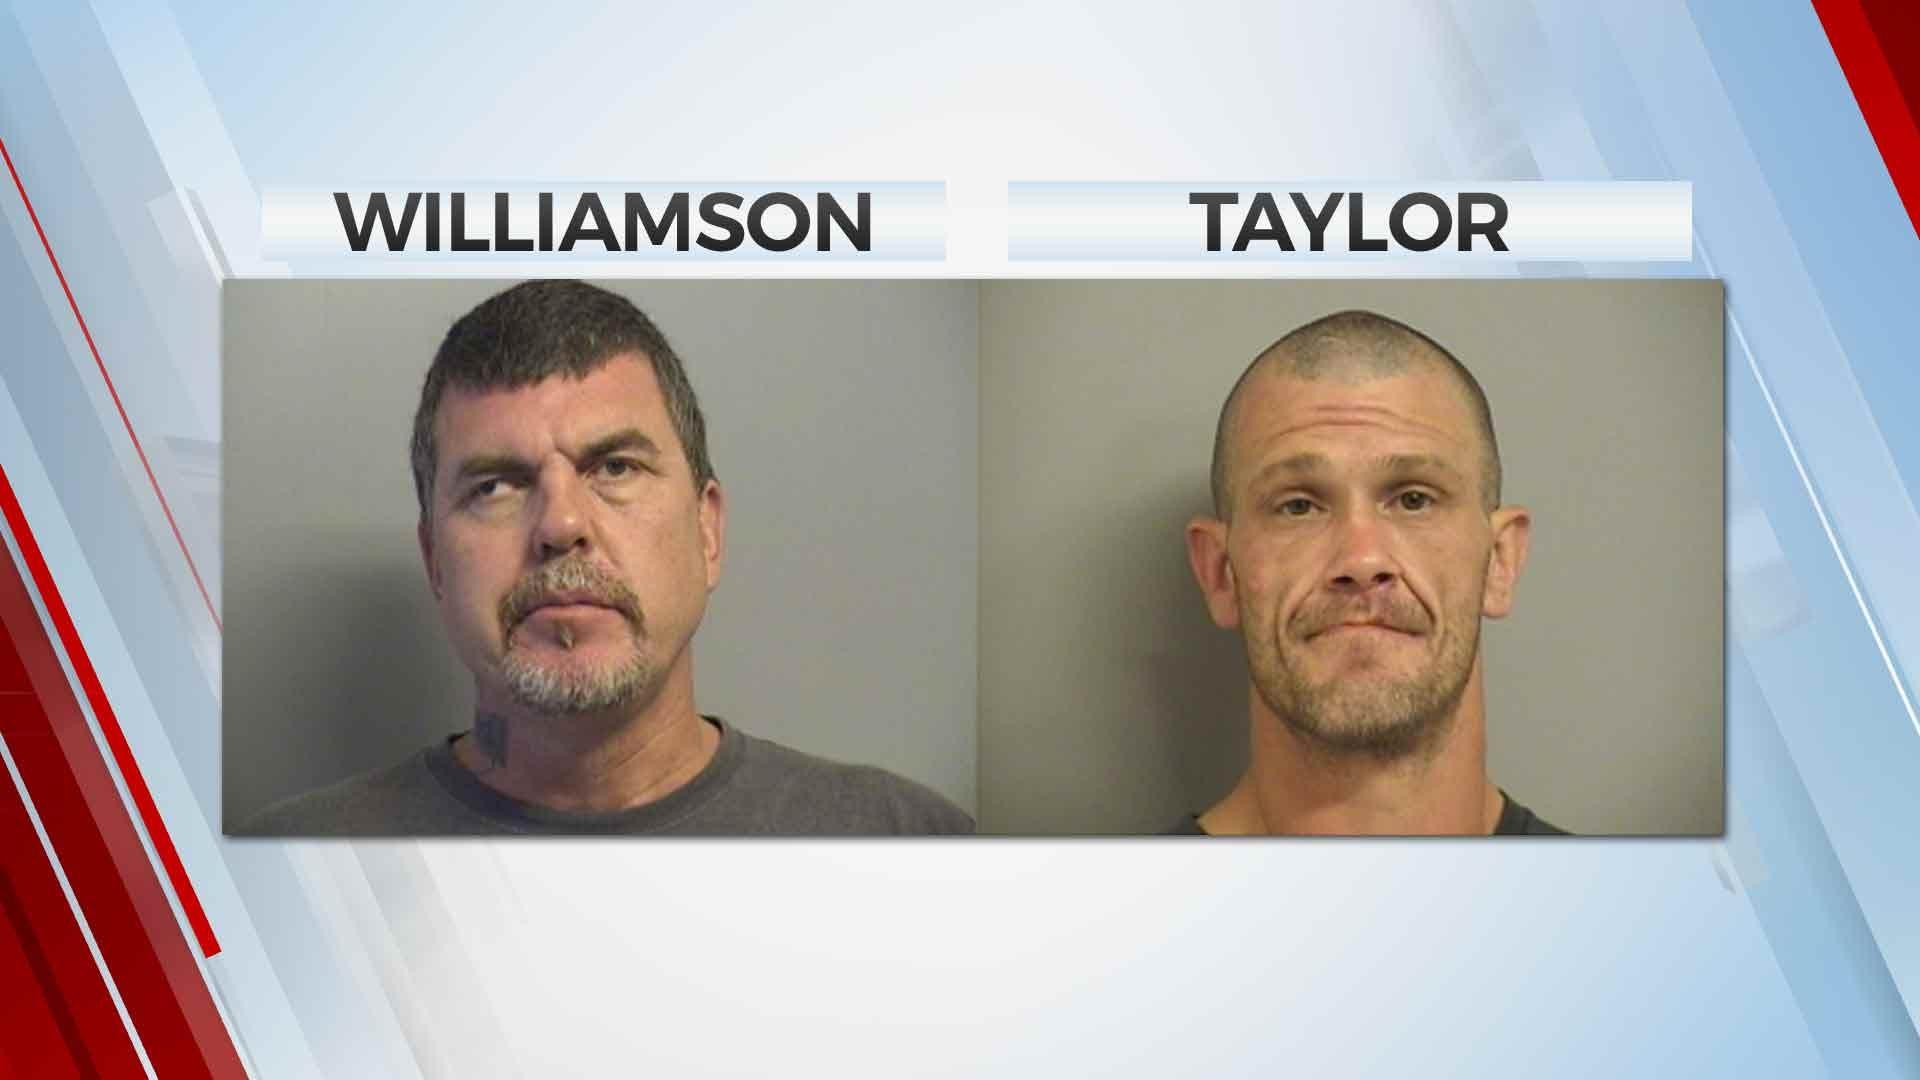 Sheriff's Office: United Aryan Brotherhood Members Sought In Death Of Tulsa Man